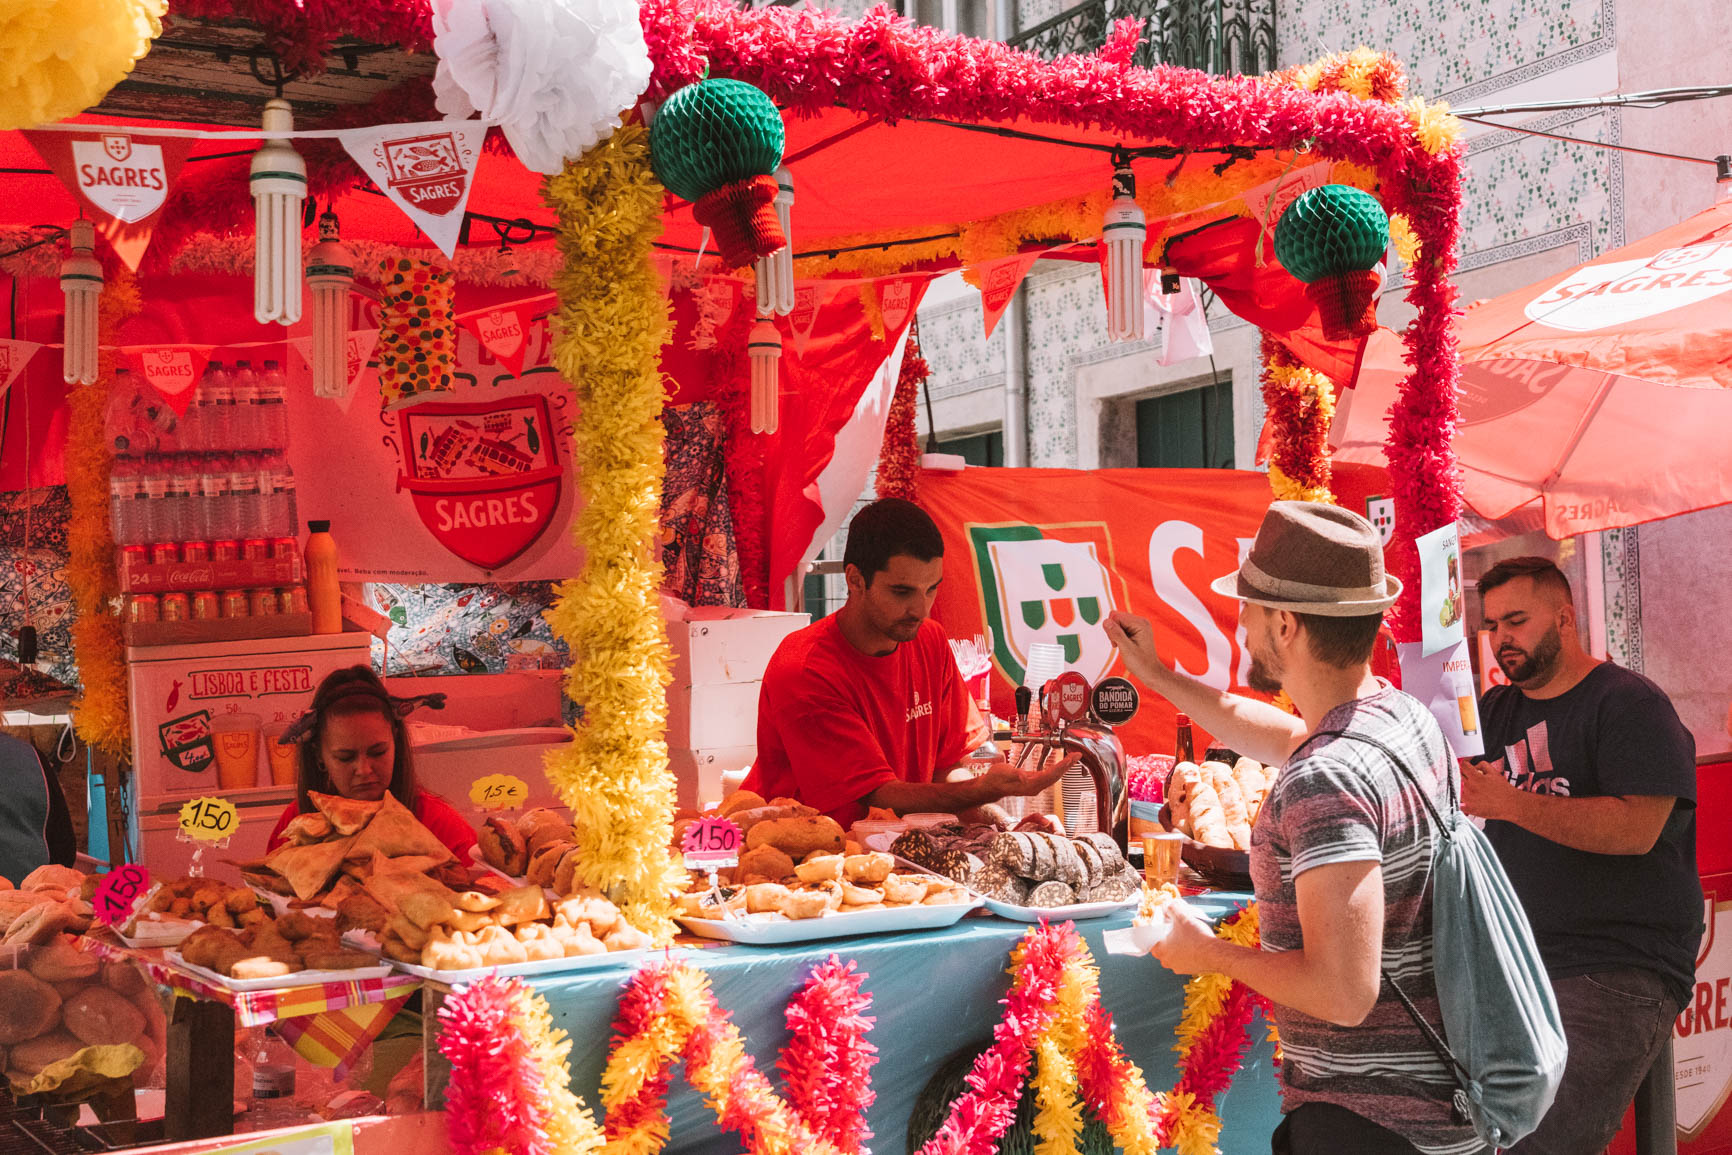 Portugal Street Food